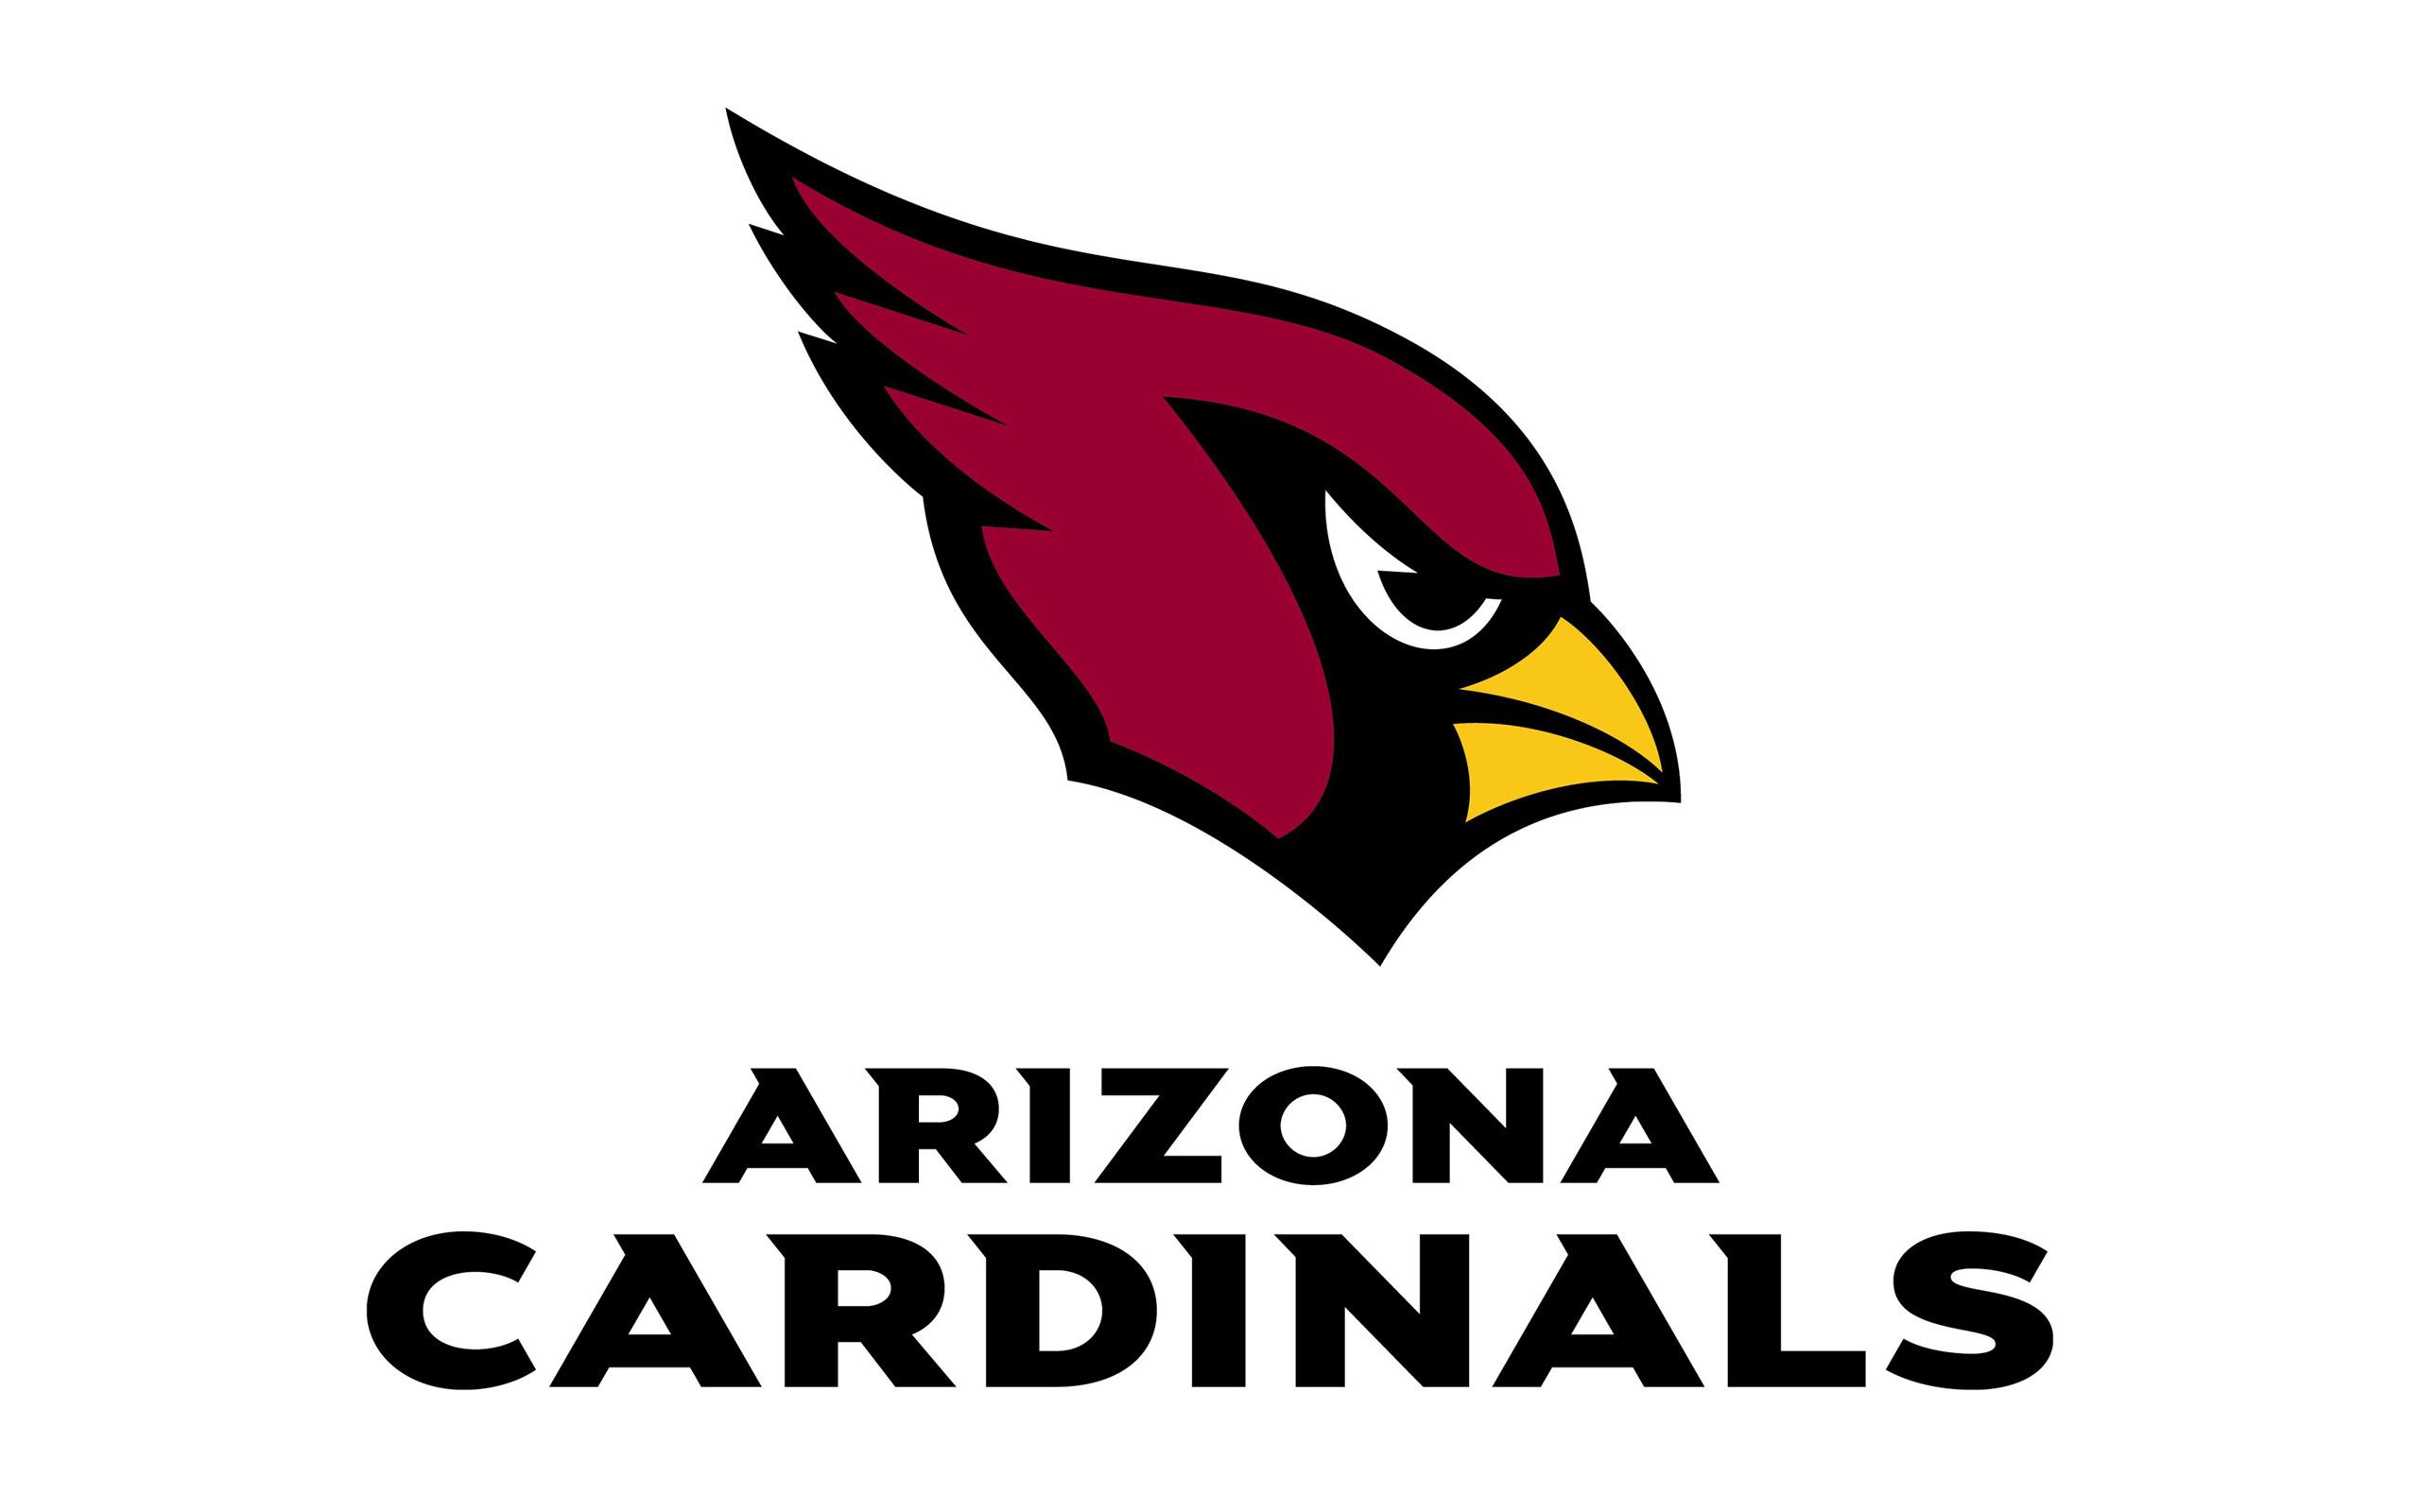 Arizona cardinals clipart 5 » Clipart Station.